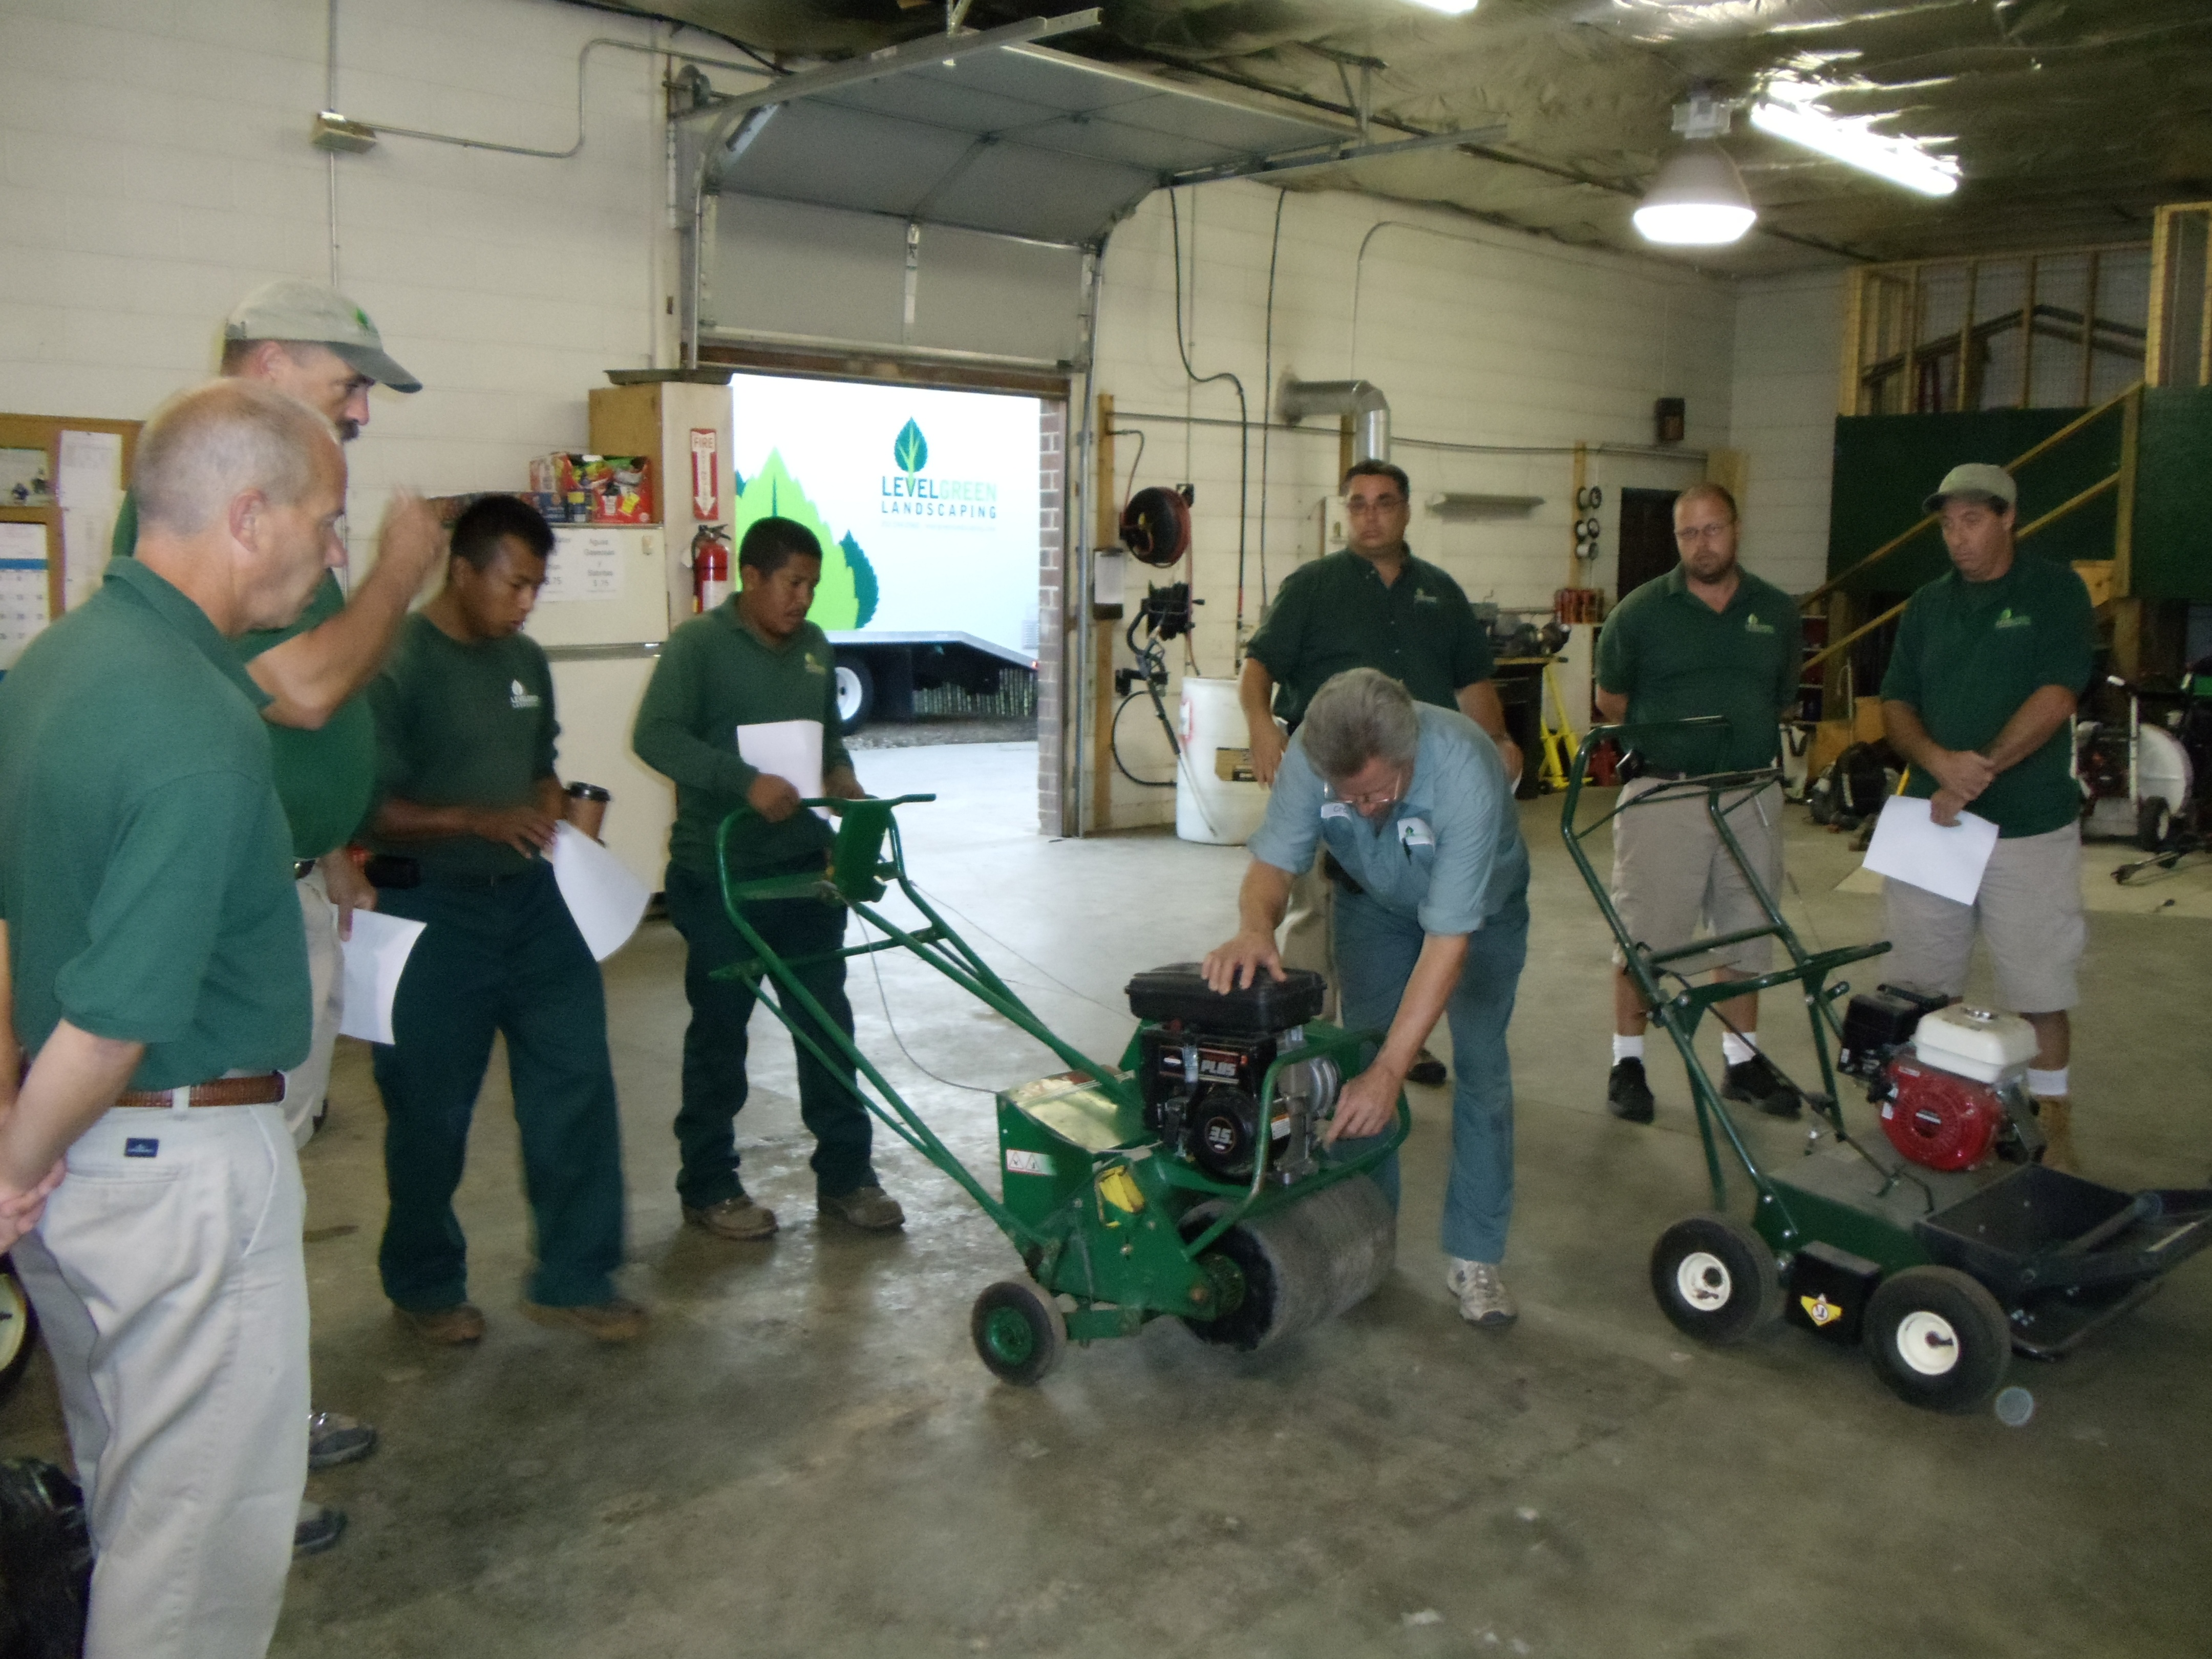 Level Green Landscaping Aeration Training